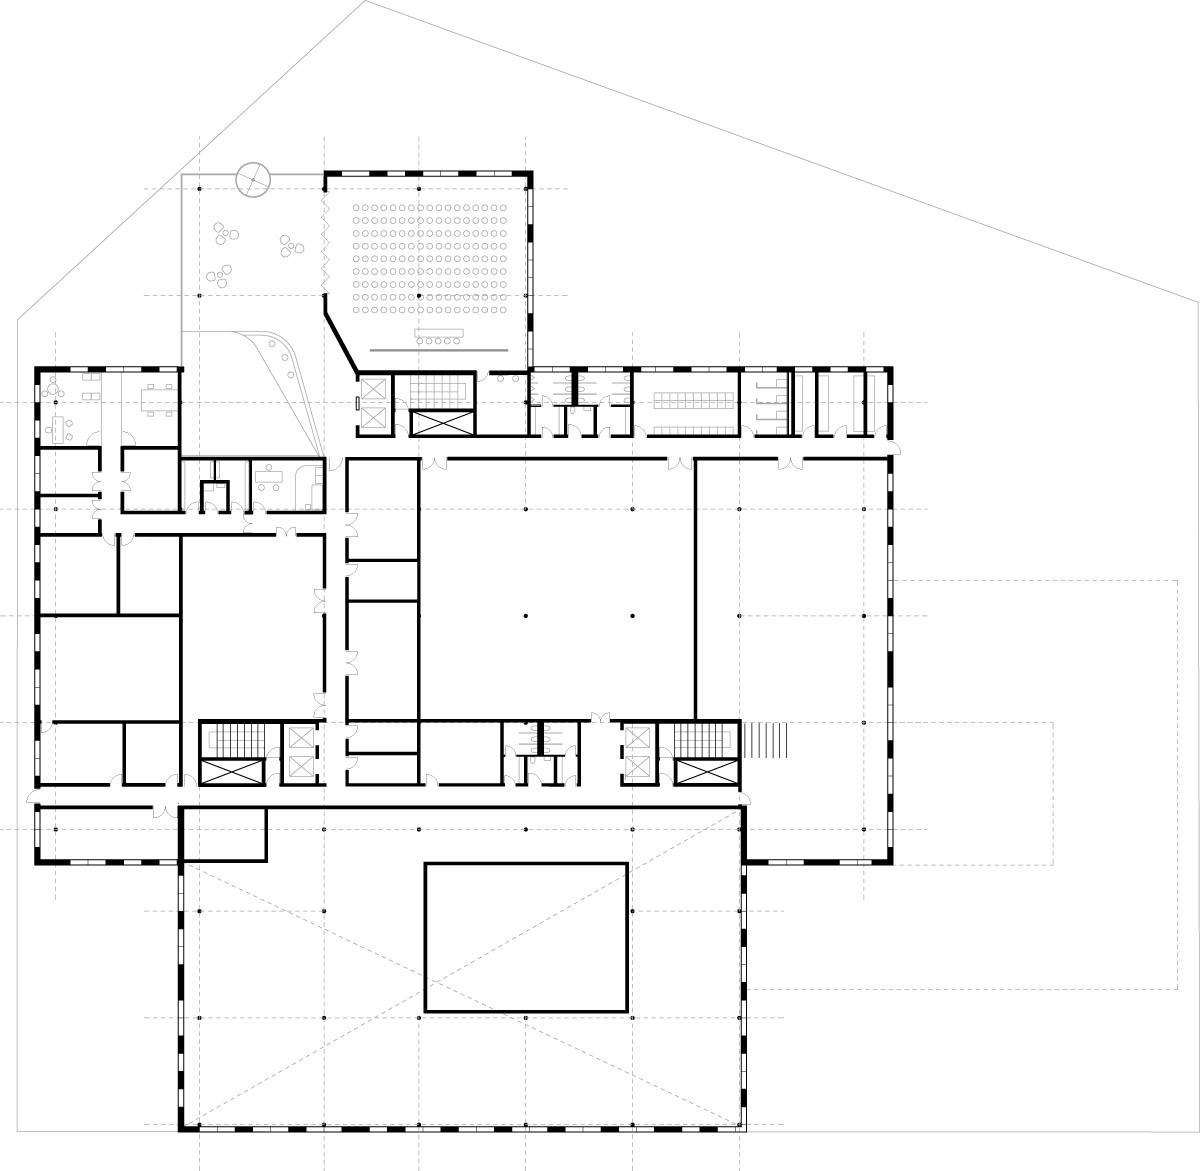 ZSW 00 PLAN (Image: Henning Larsen Architects)